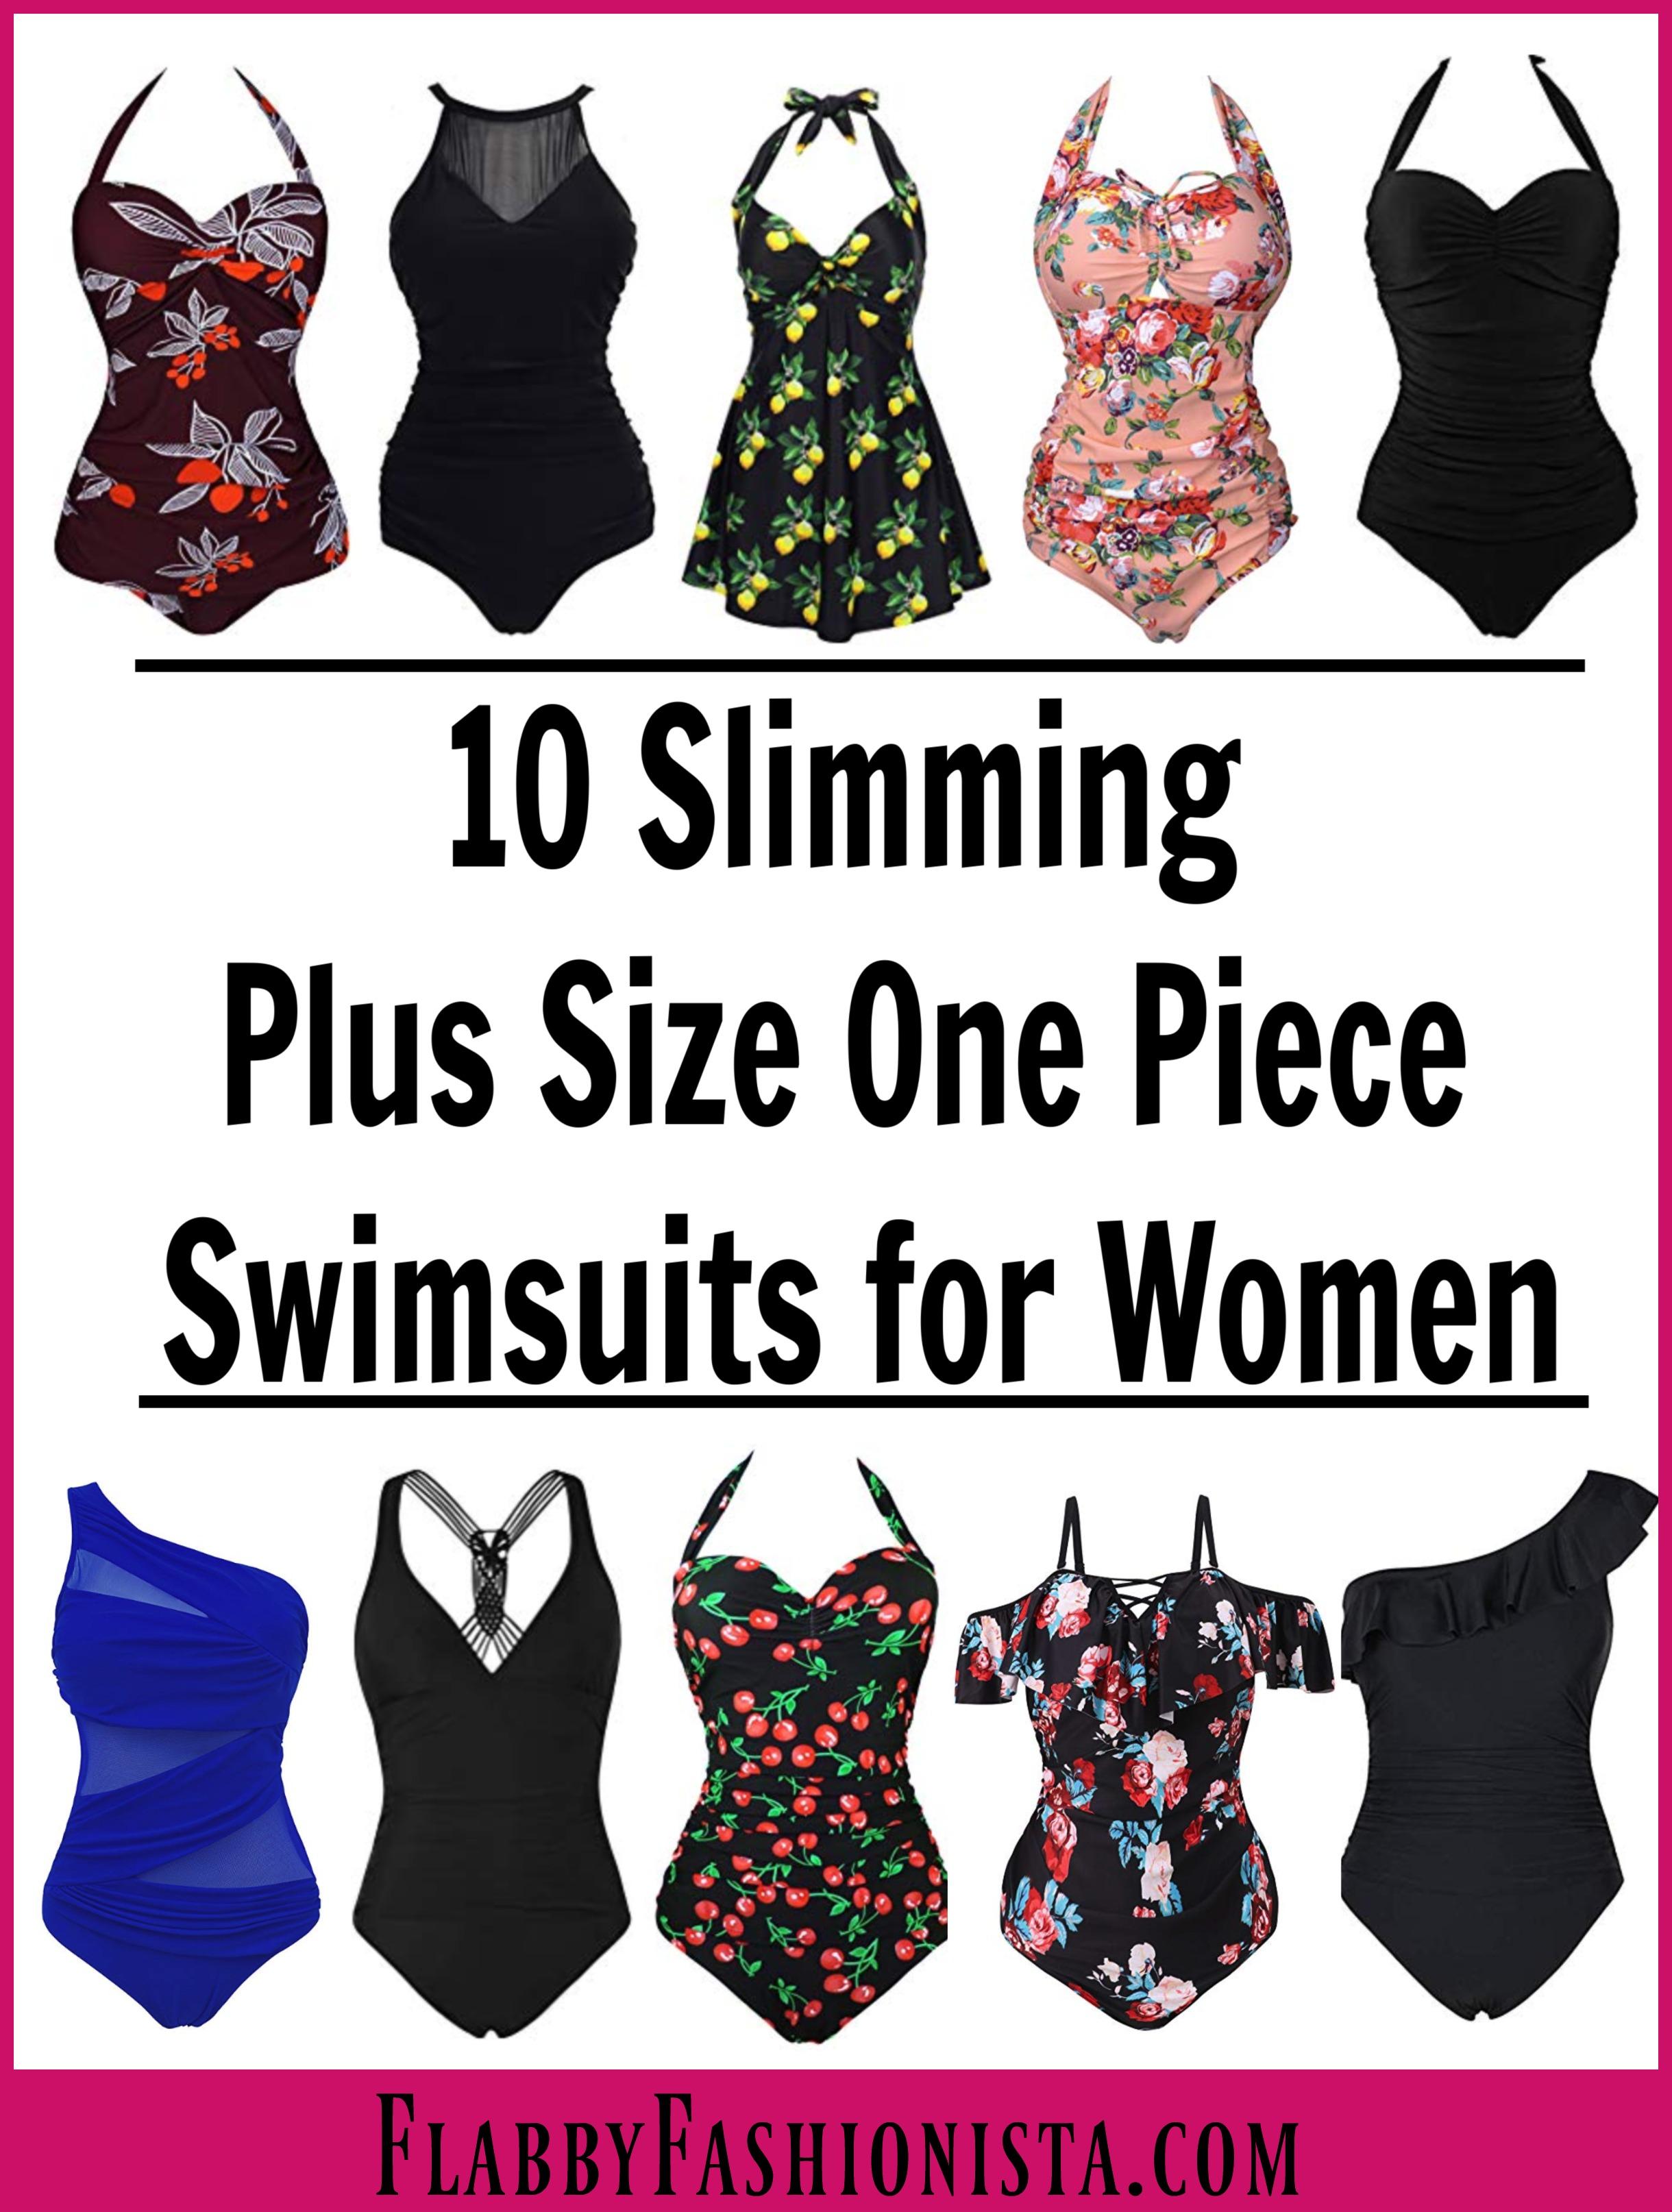 ebd9892a4f961 Slimming One Piece Plus Size Swimsuits - Flabby Fashionista - Plus Size  Fashion Blog